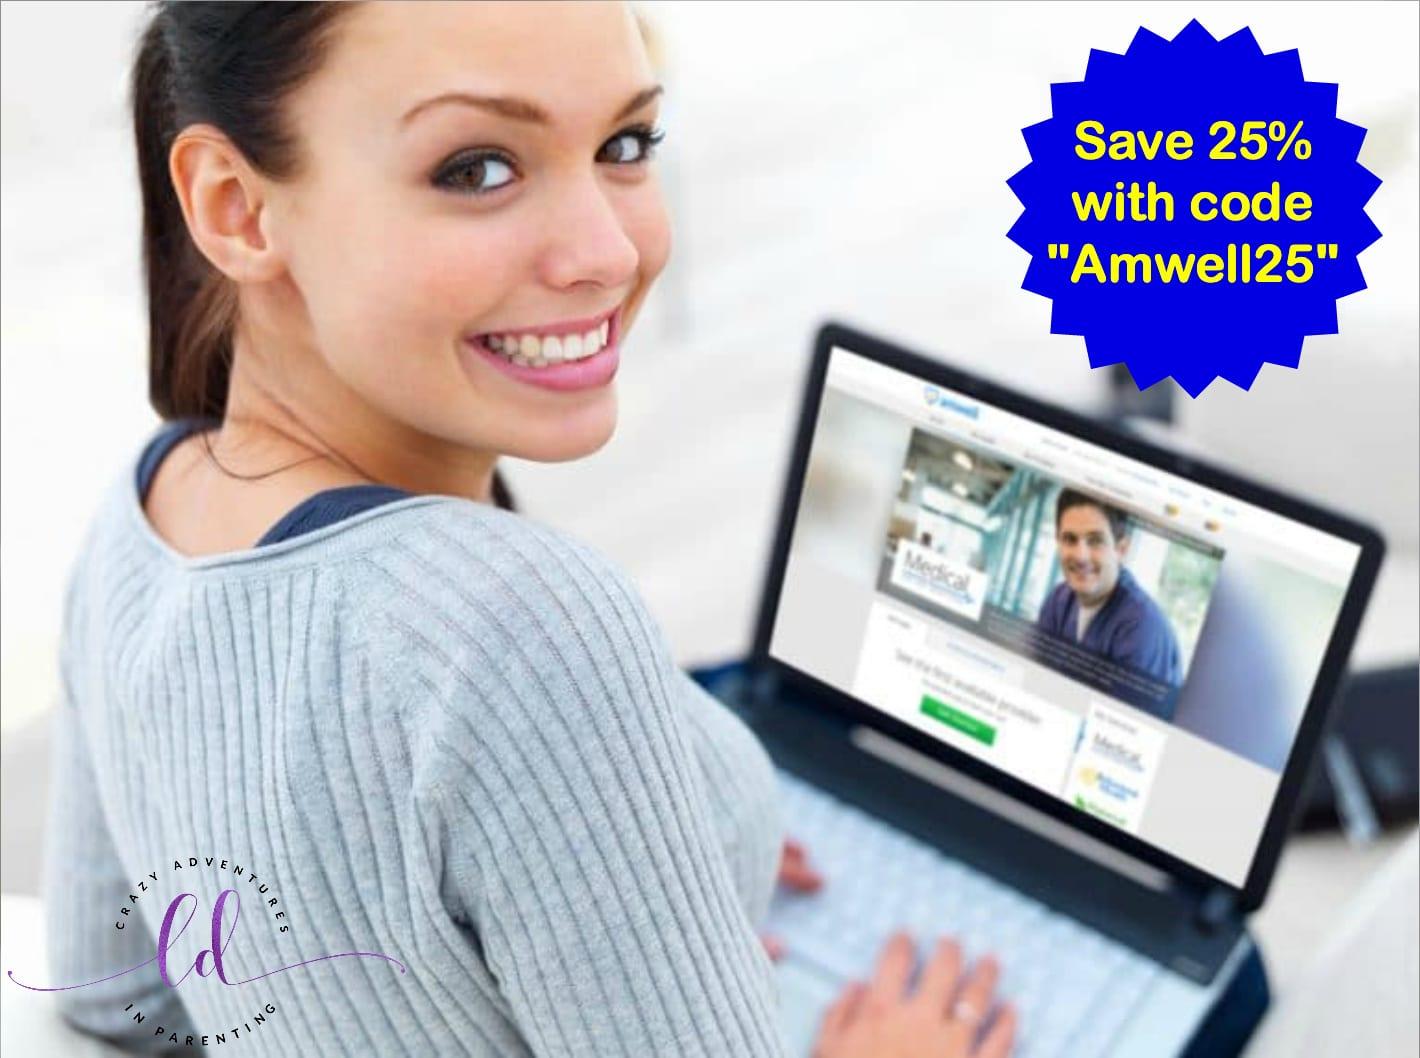 Amwell Discount Code 2019